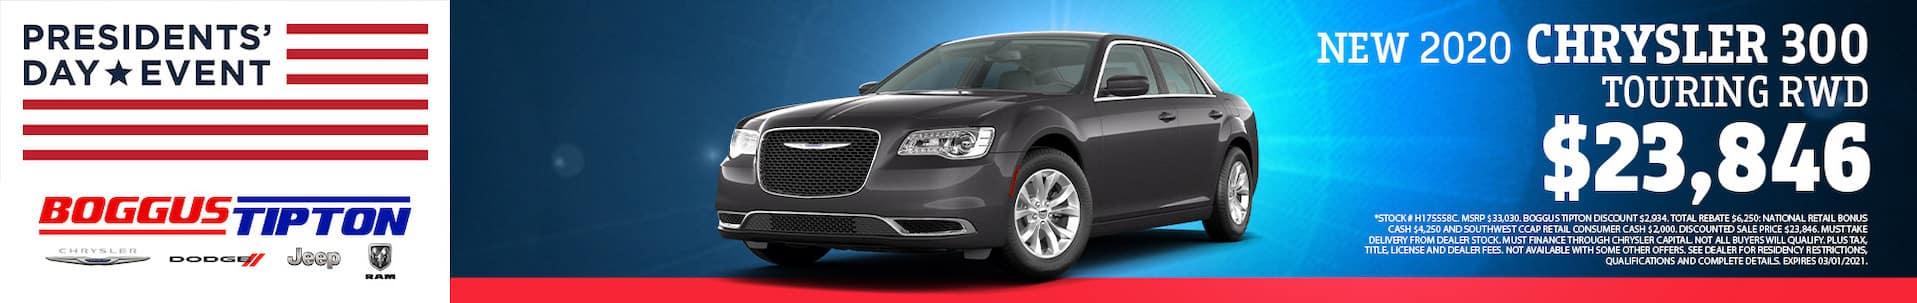 Chrysler your trade